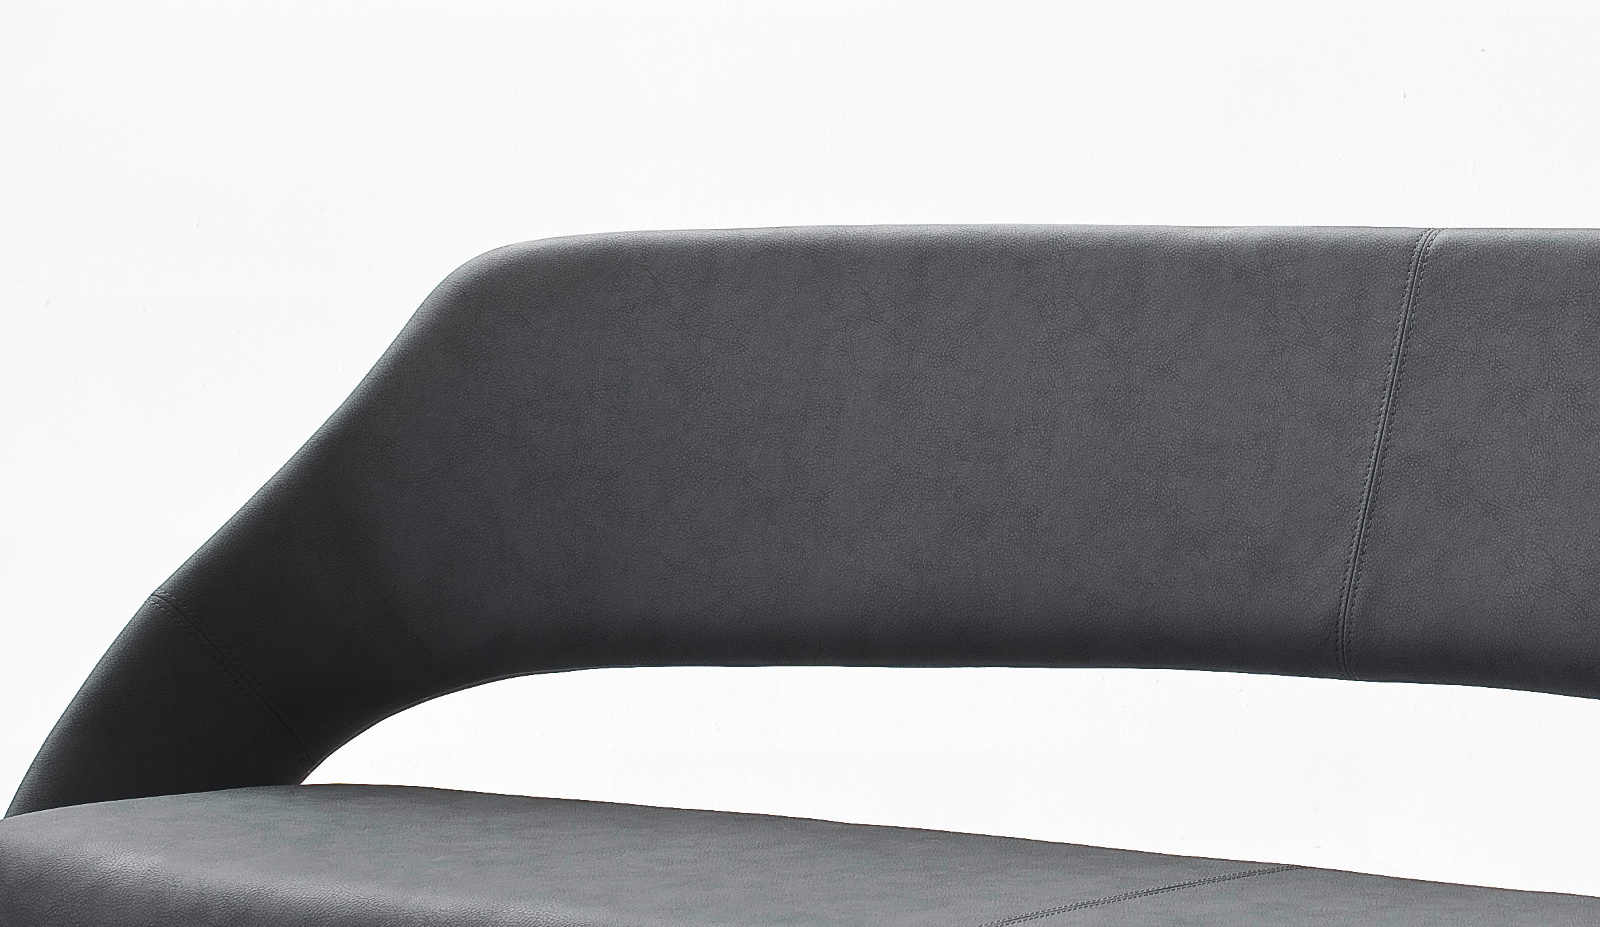 badm bel badschrank wei hochglanz lack nussbaum dressy10 designerm bel moderne m bel owl. Black Bedroom Furniture Sets. Home Design Ideas